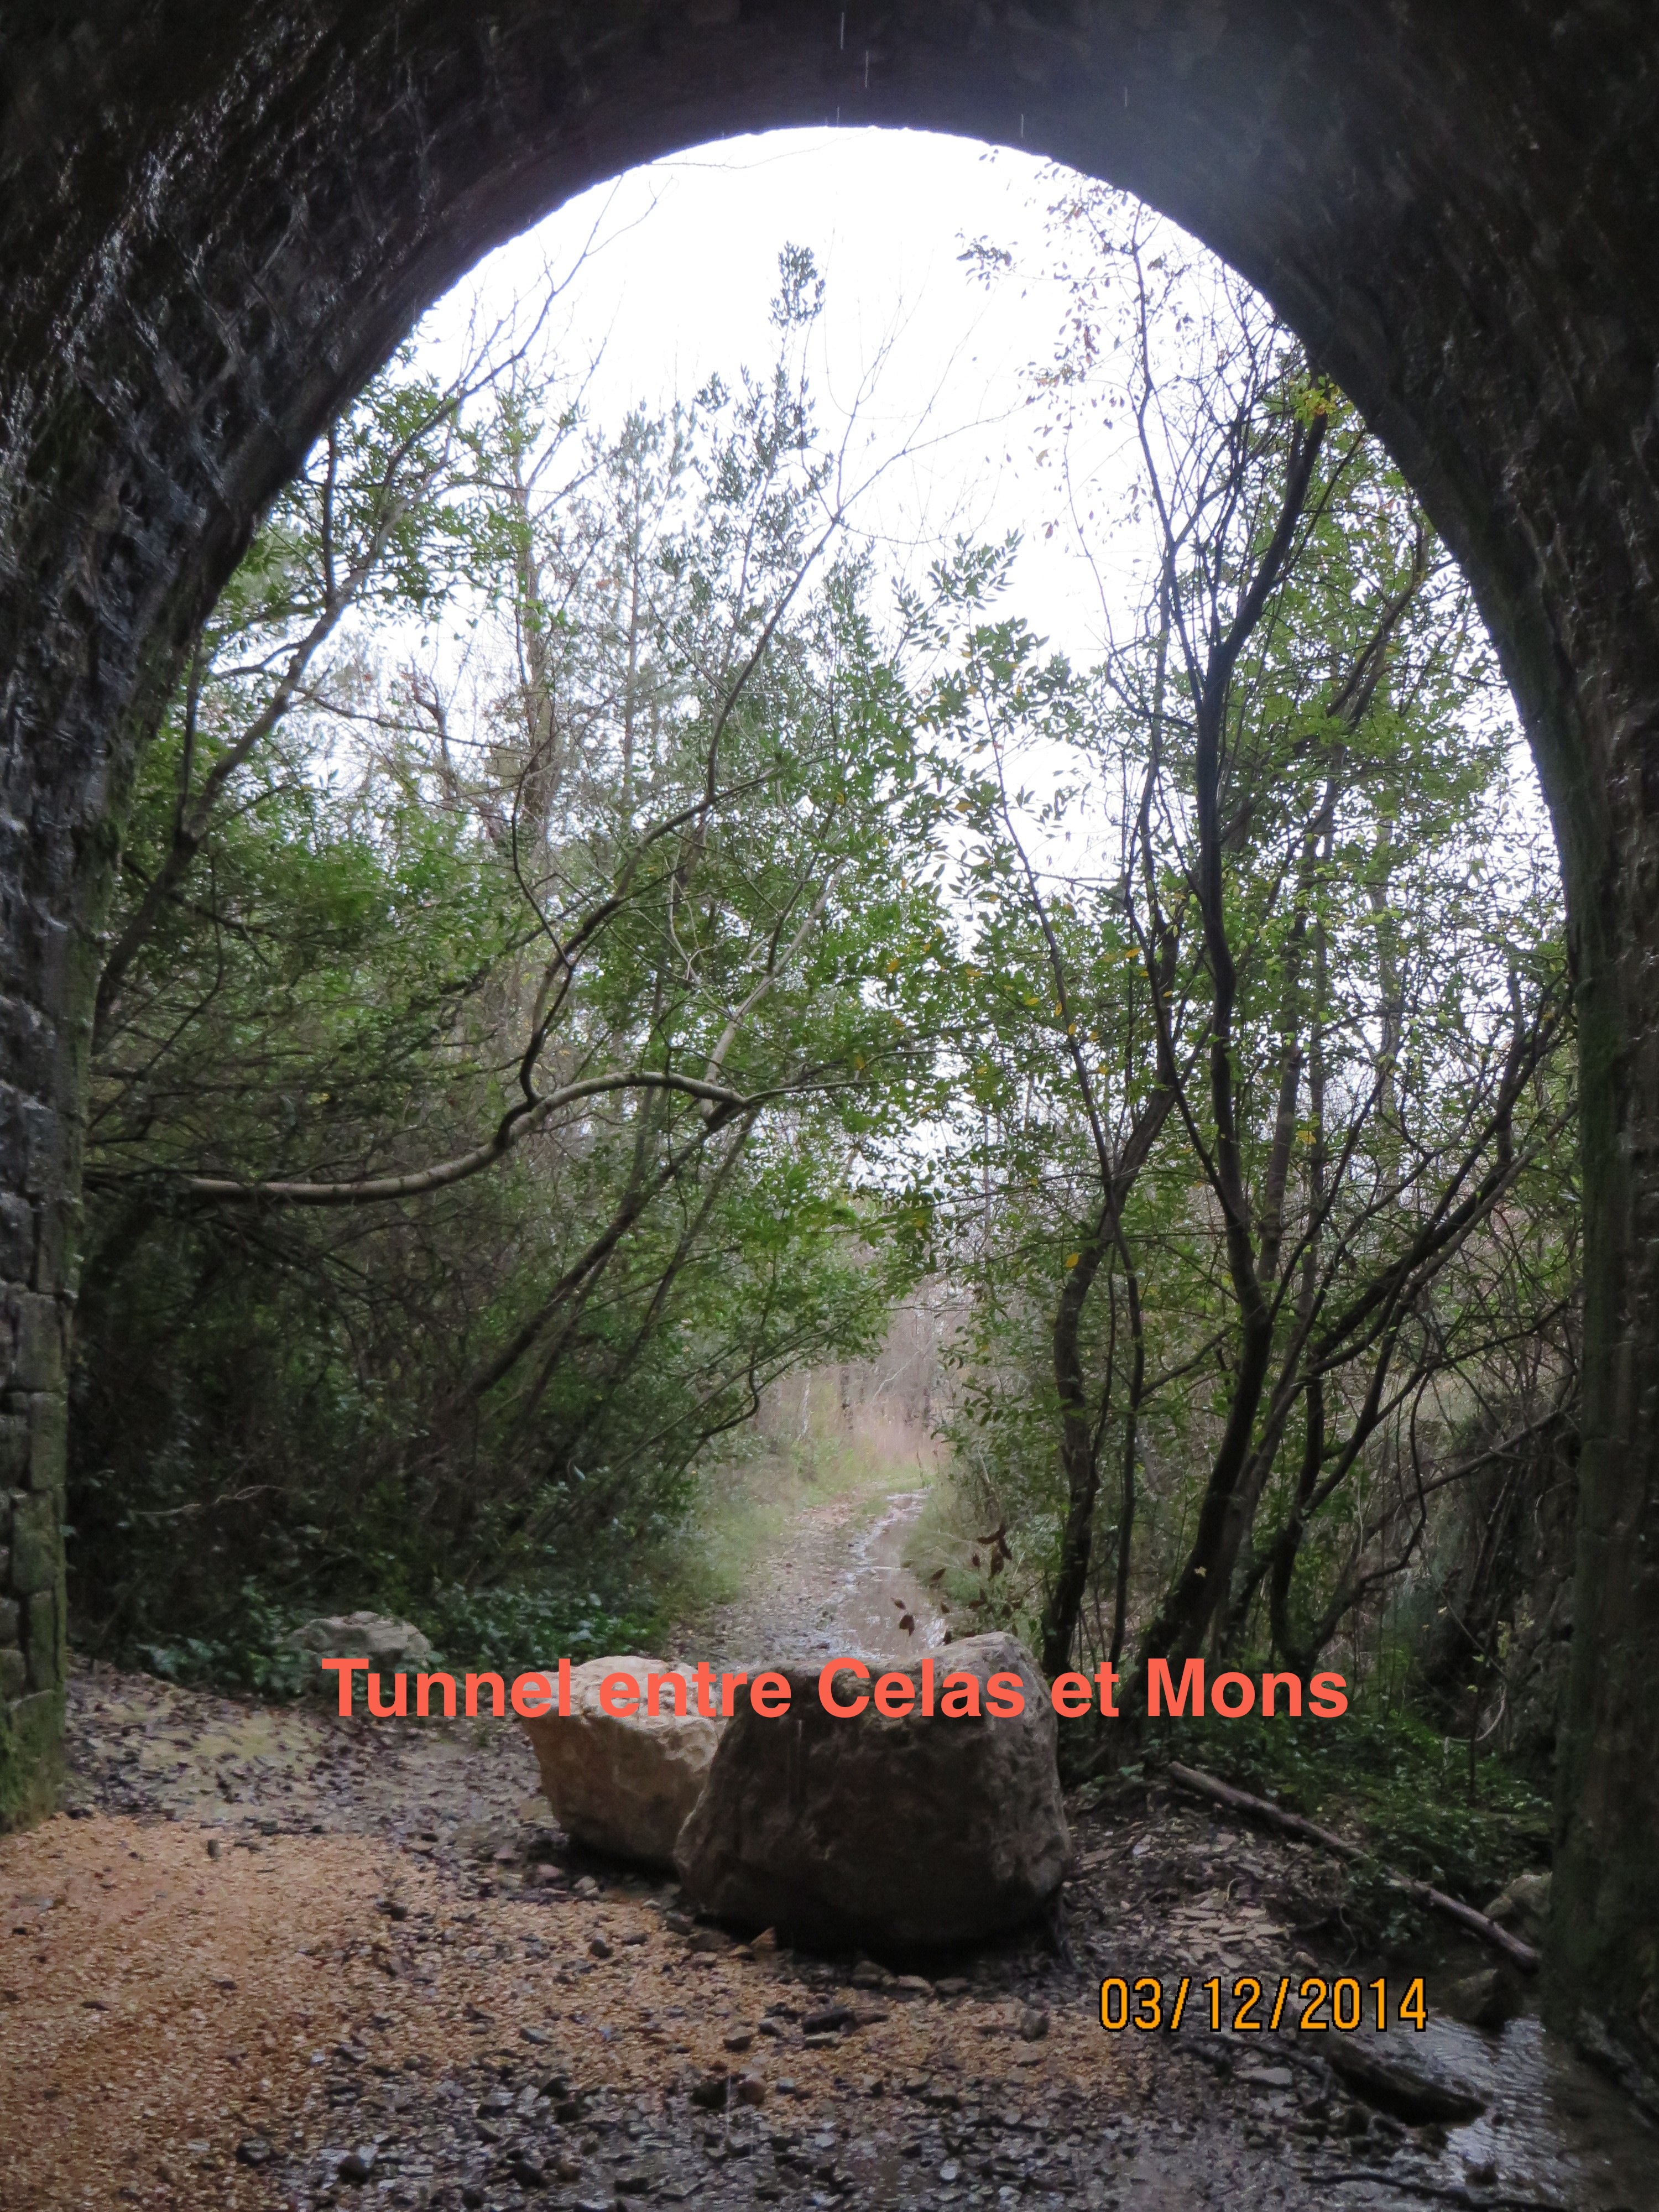 1 Entree tunnel cotu00E9 Celas